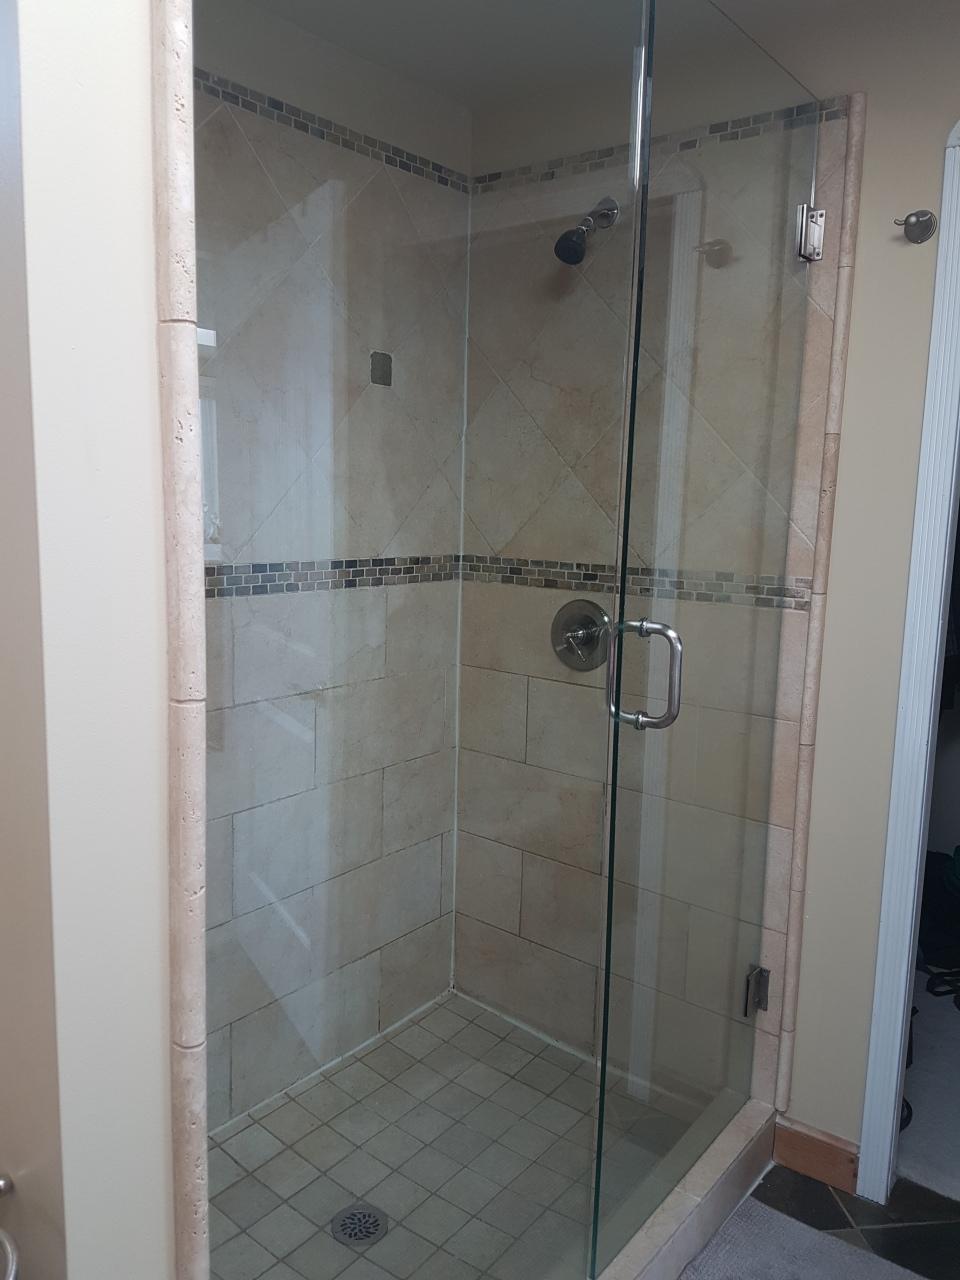 Bathroom shower doors closed